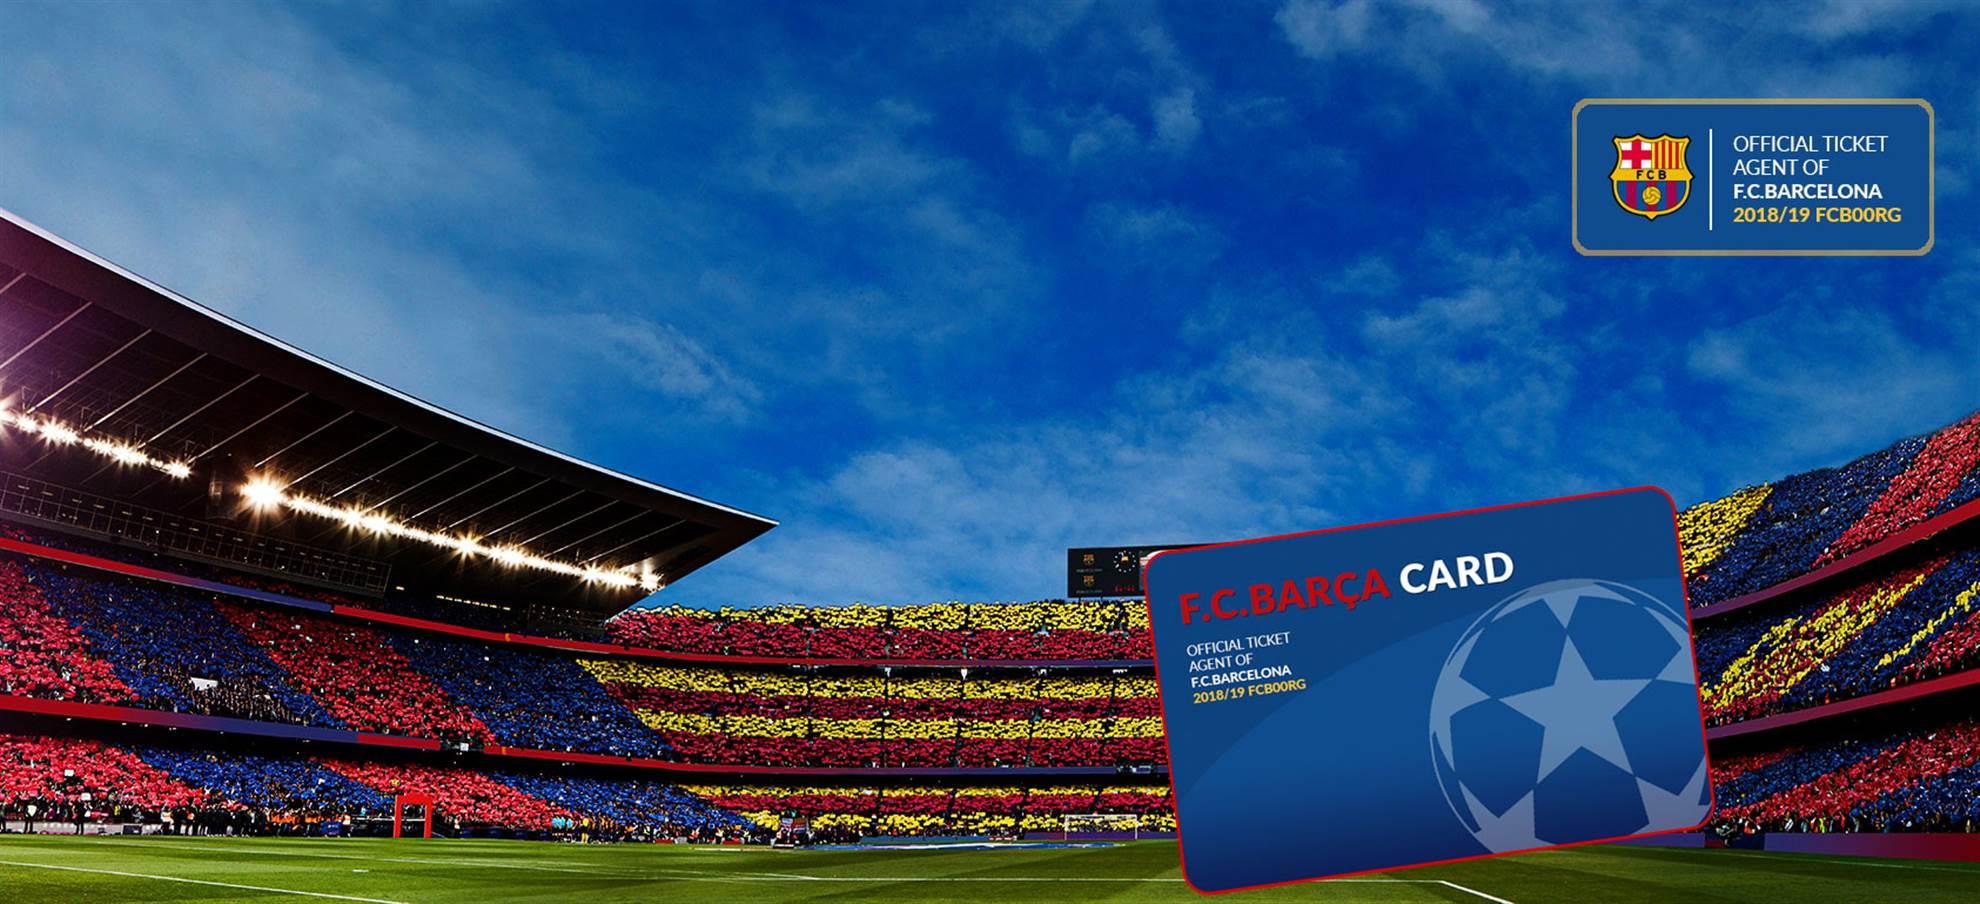 FC BARÇA CARD ´Ein perfekter Urlaubstag im Camp Nou´